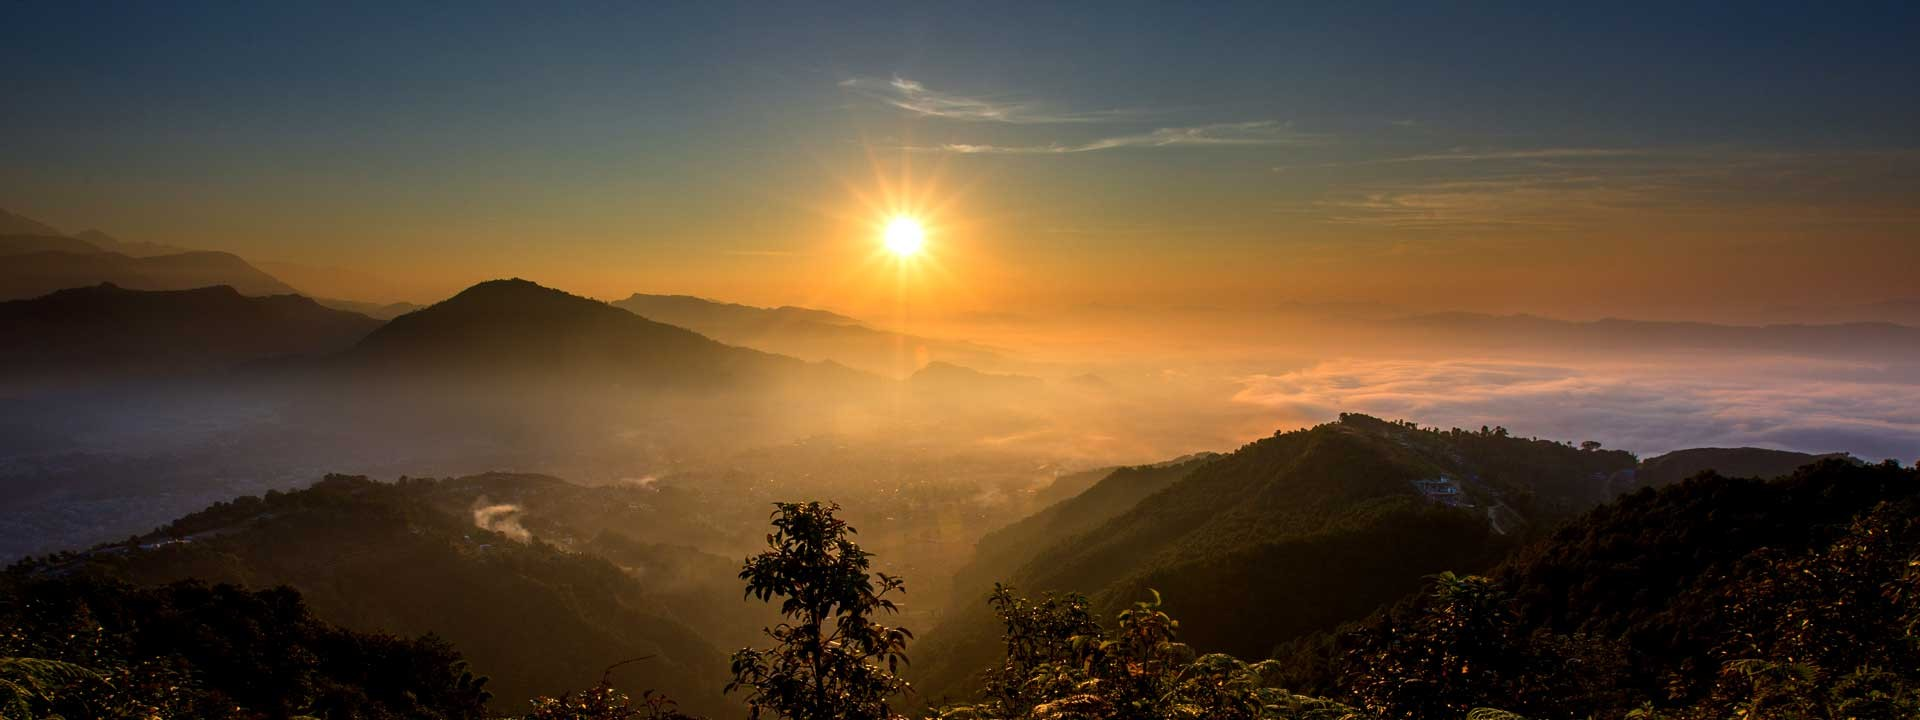 Epic Journeys around Nepal